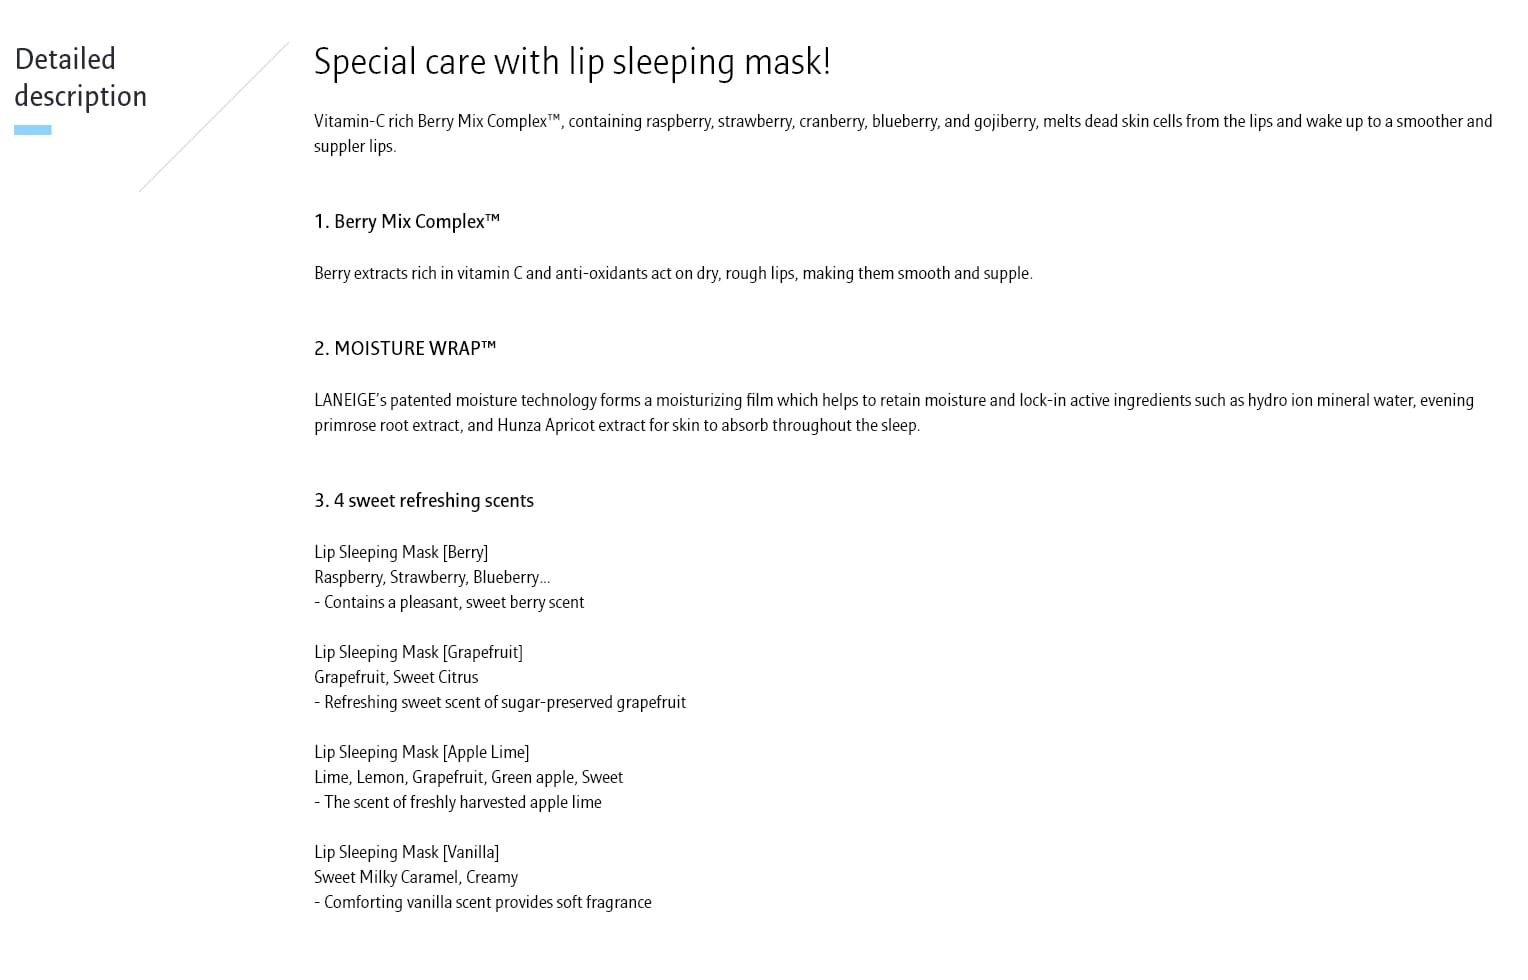 Laneige Lip Sleeping Mask - details